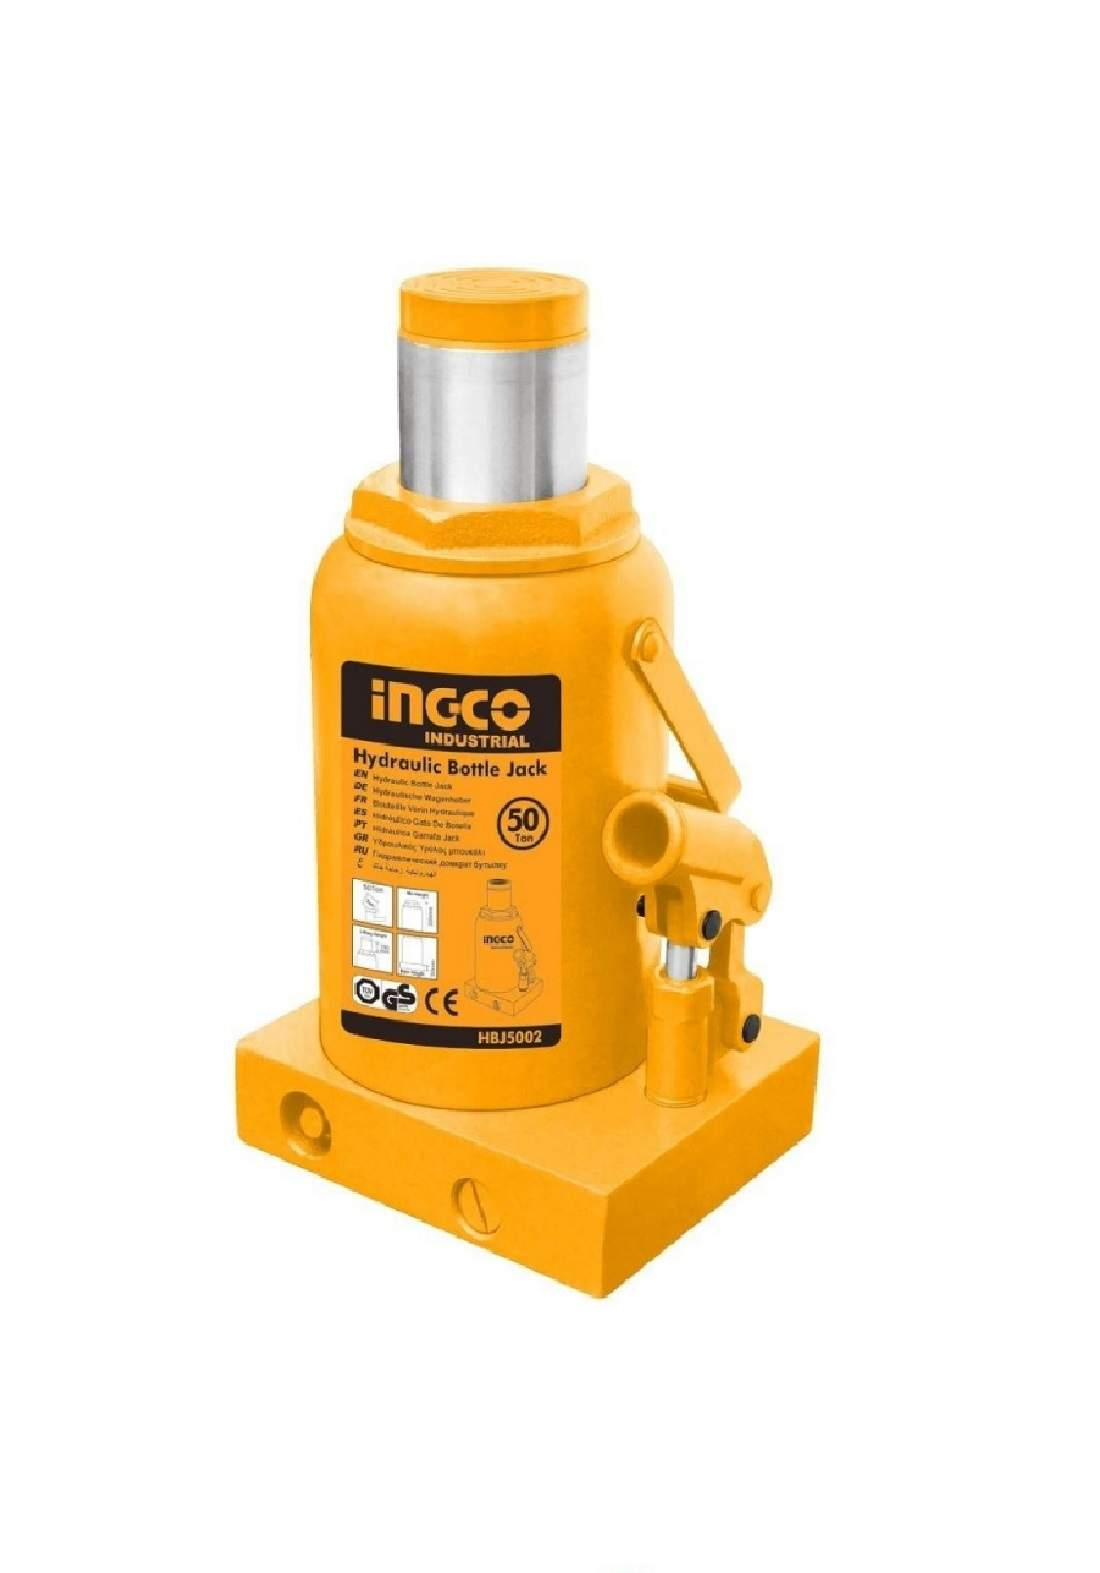 Ingco HBJ5002 Hydraulic Jack 50 Tons جك هيدروليك